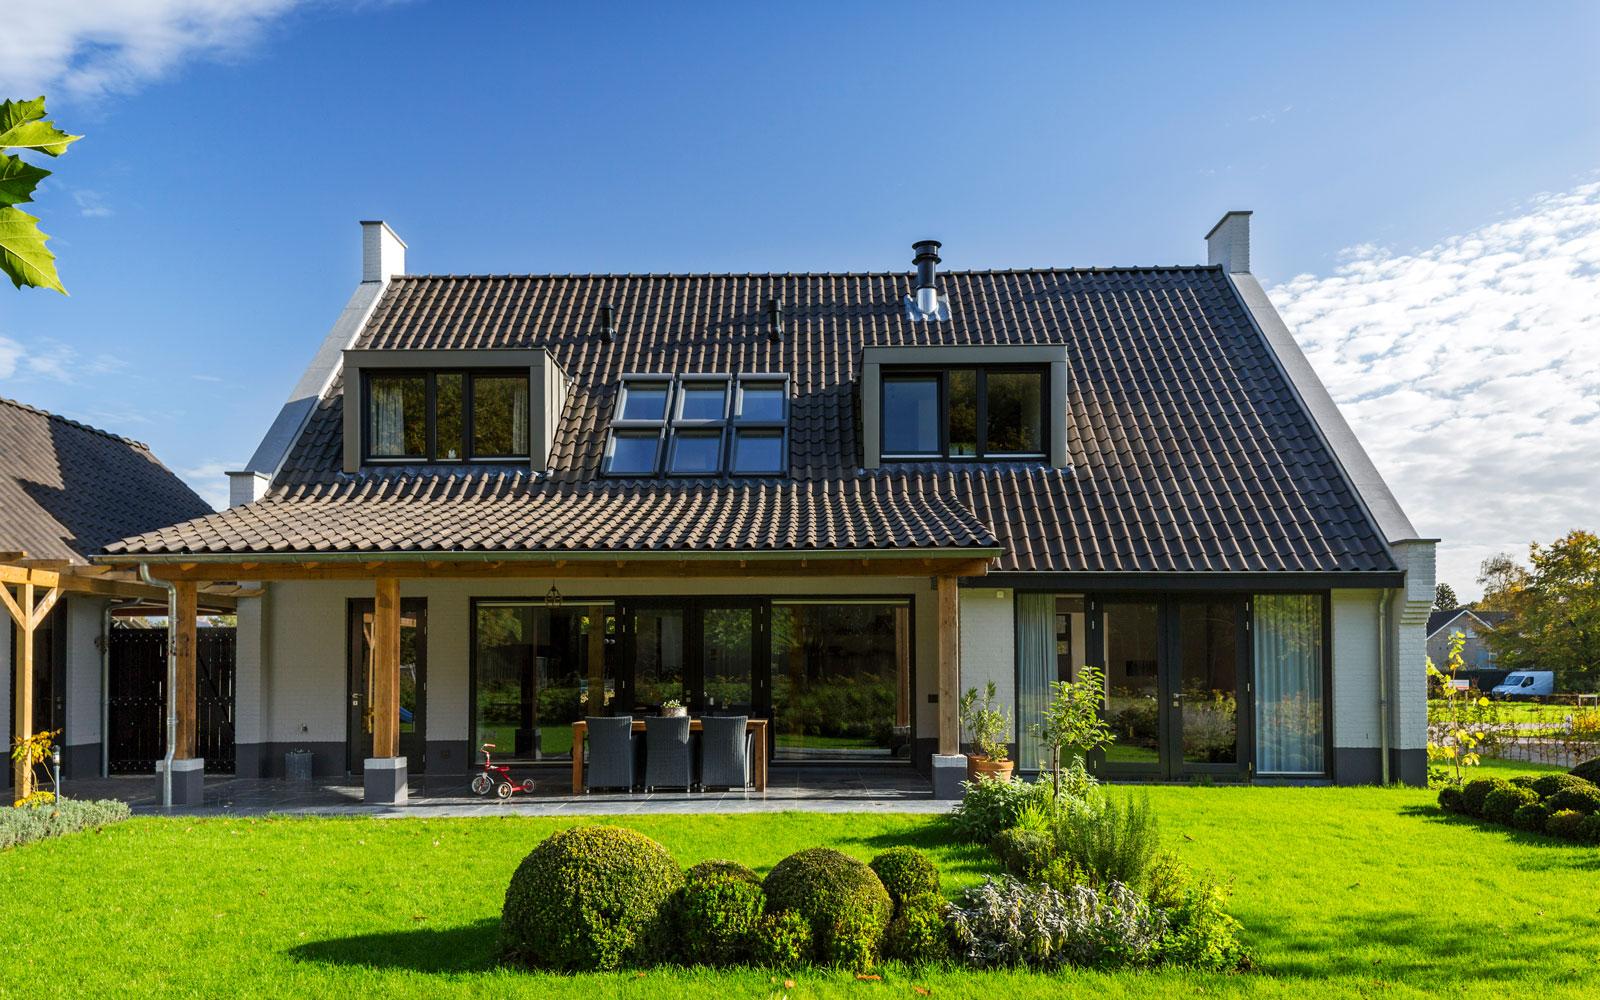 The Art of Living, Exclusief wonen, Van Gogh Bouwbedrijf, tuin, landhuis, terras, garage, architectuur, tuinarchitectuur, exterieur